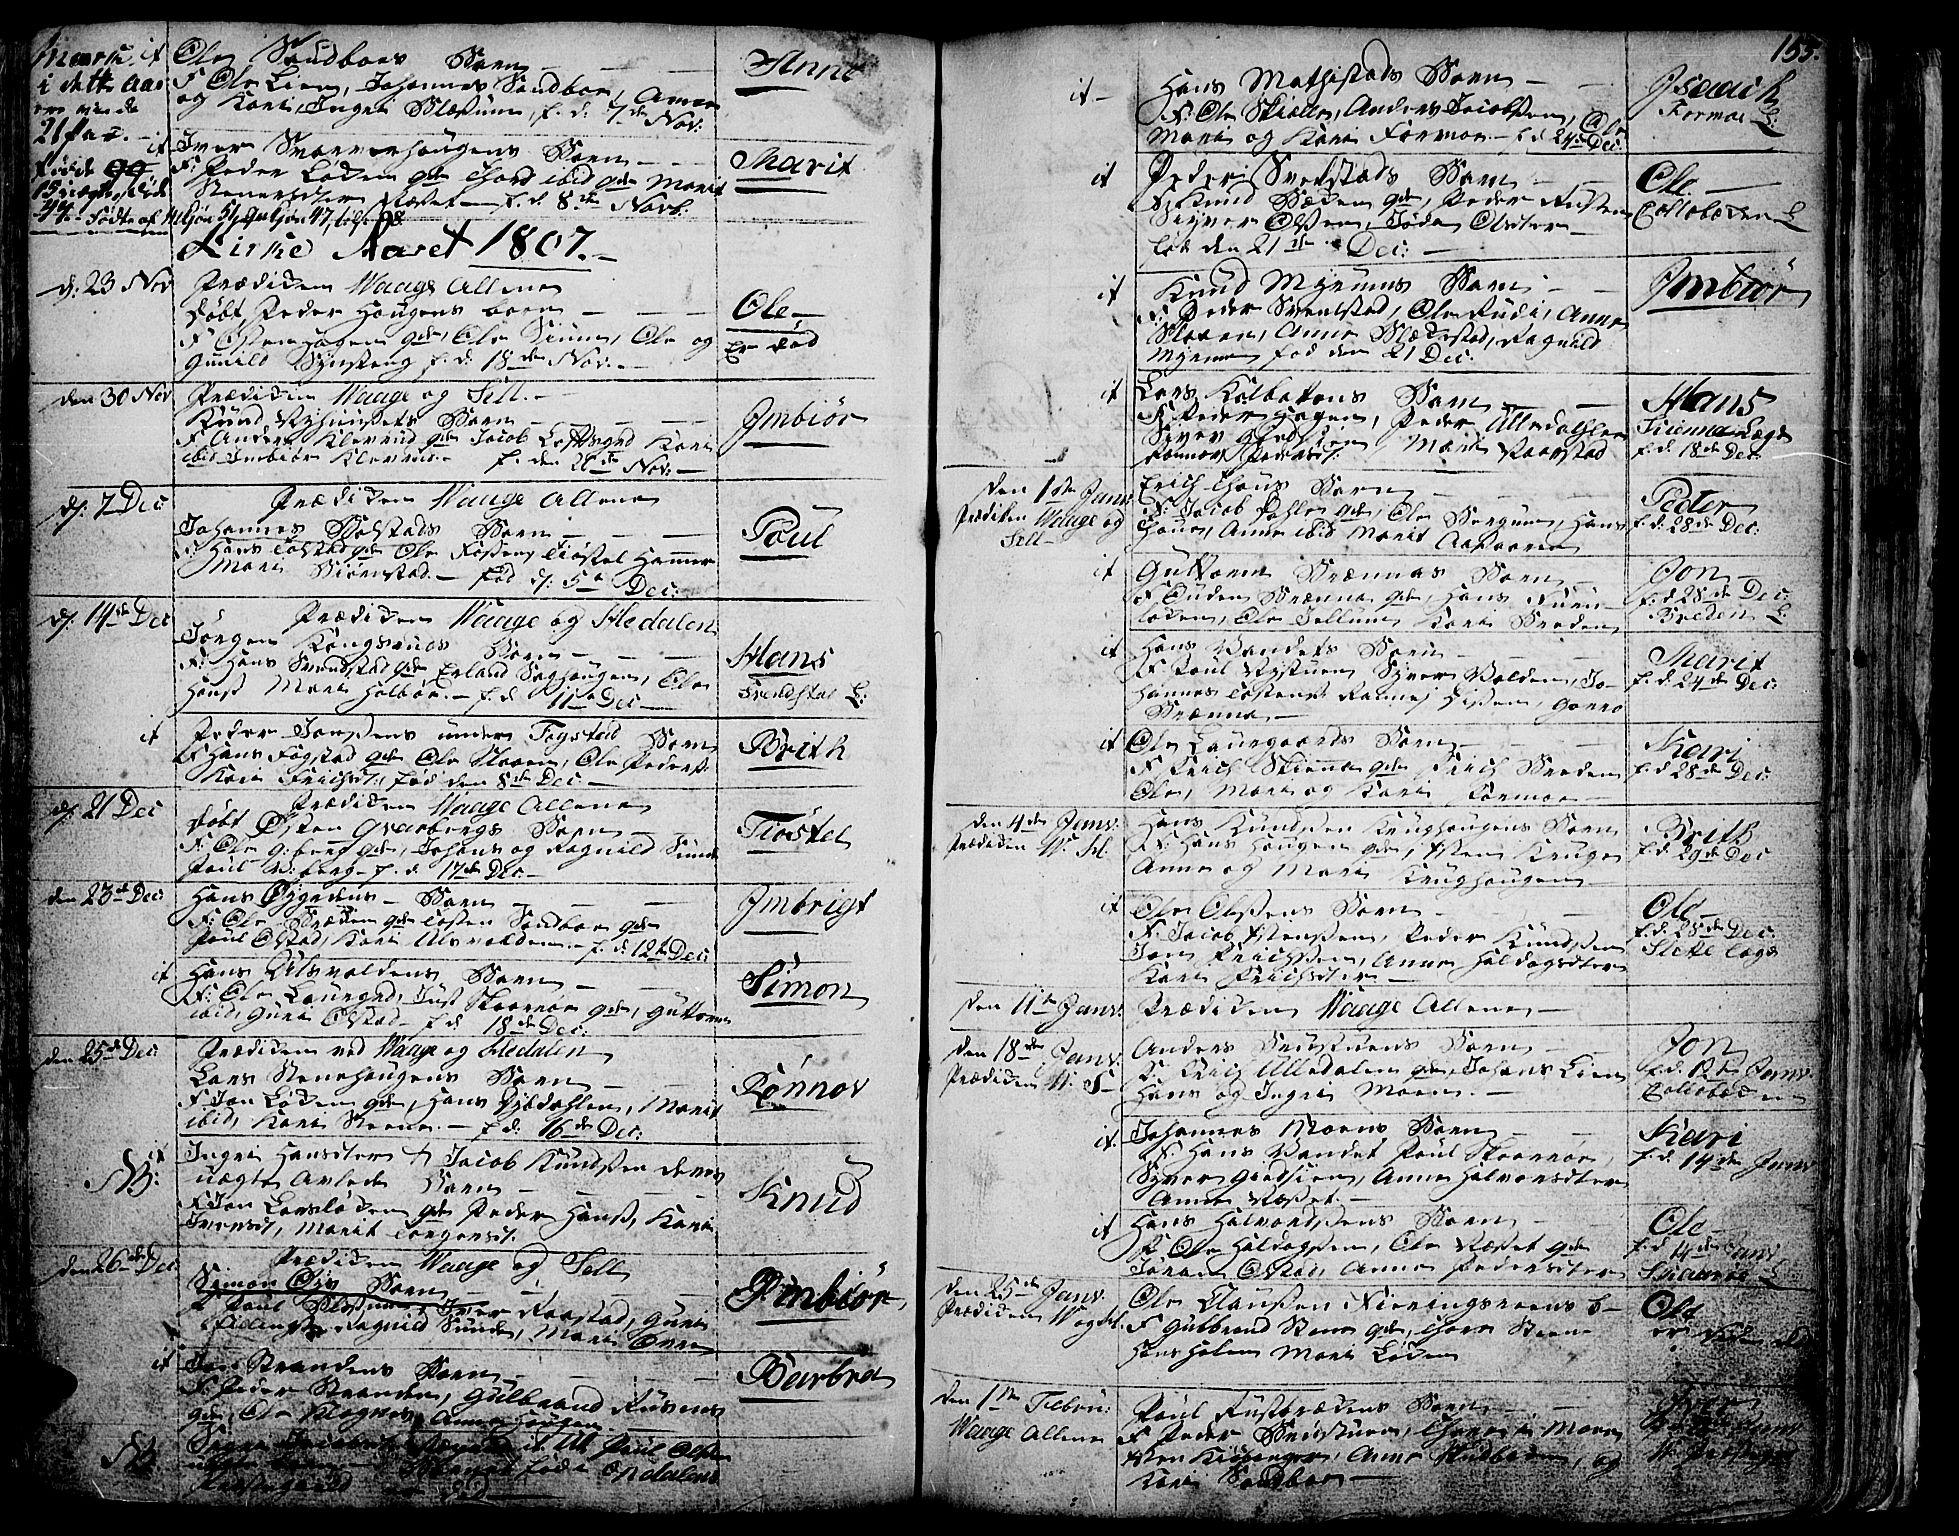 SAH, Vågå prestekontor, Ministerialbok nr. 1, 1739-1810, s. 155